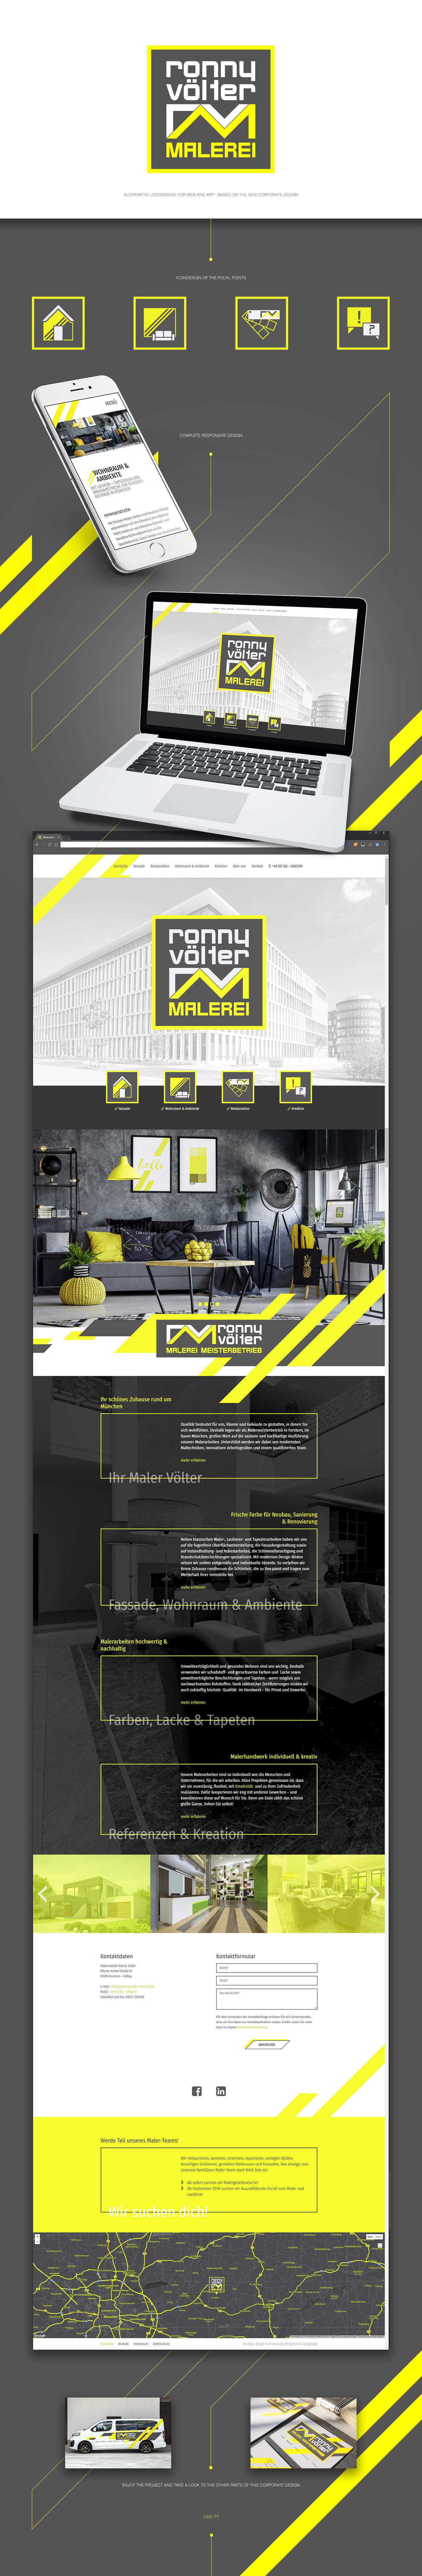 Corporate Design Webdesign painter Business Website neon yellow black grey #HP   Responsive